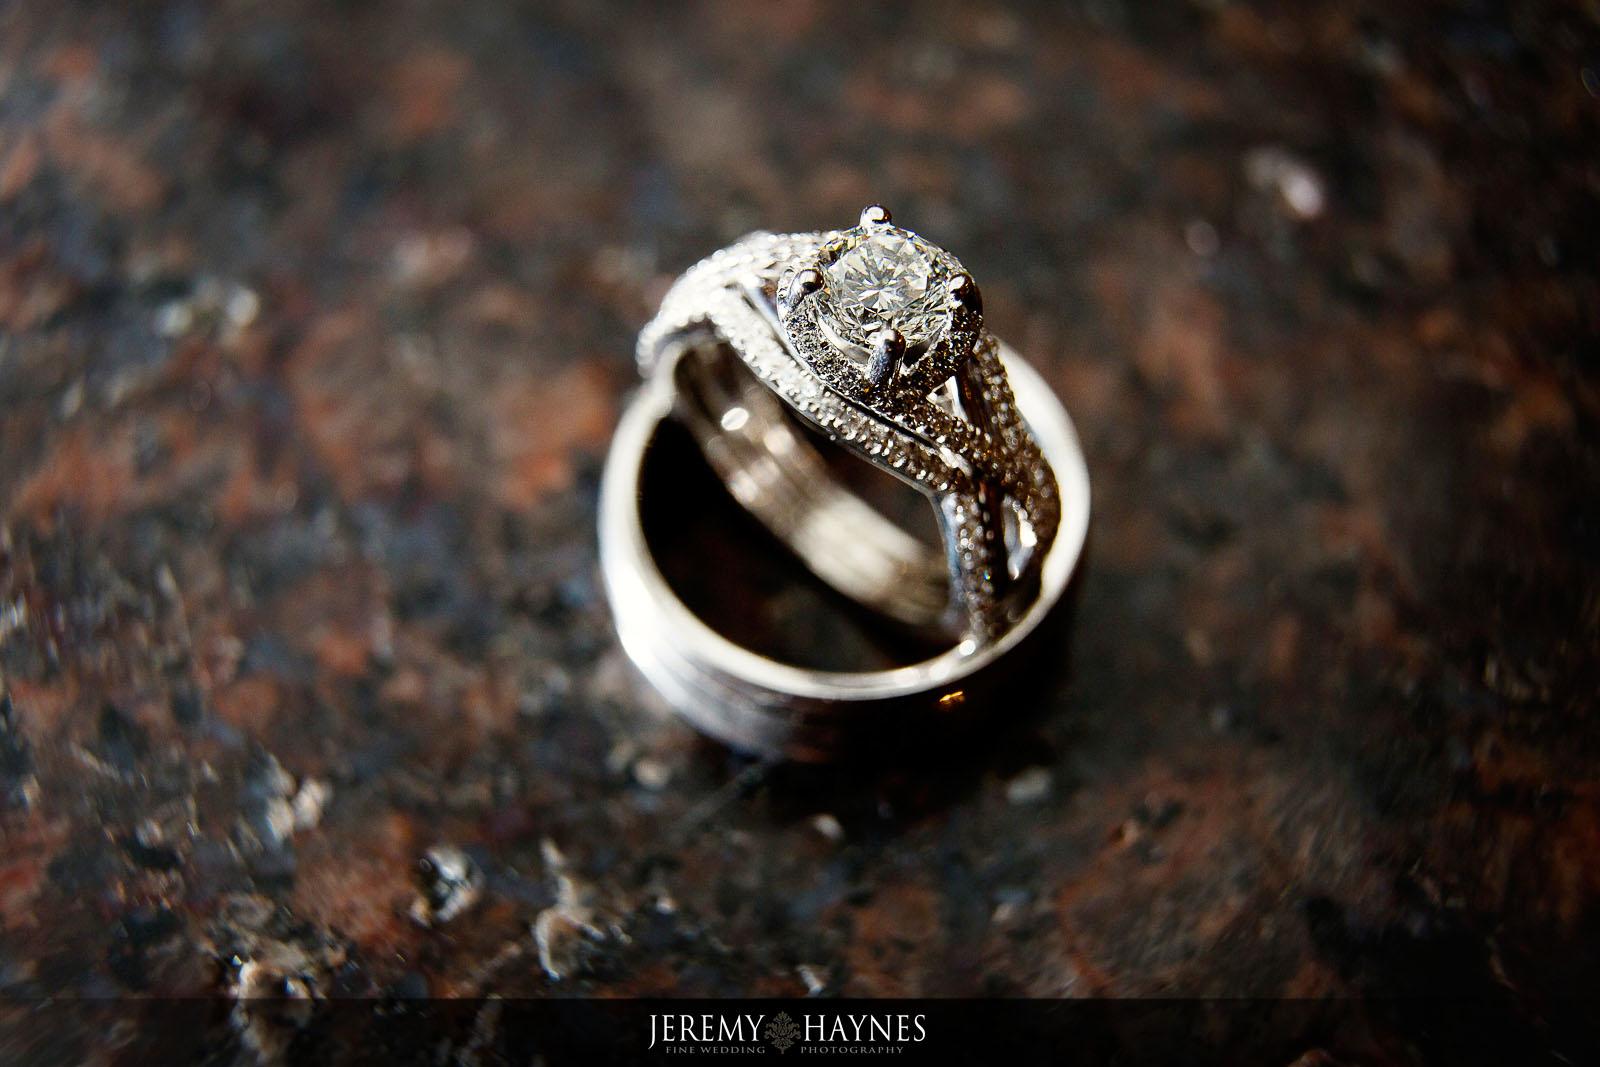 artistic-wedding-rings-jeremy-haynes-photography.jpg